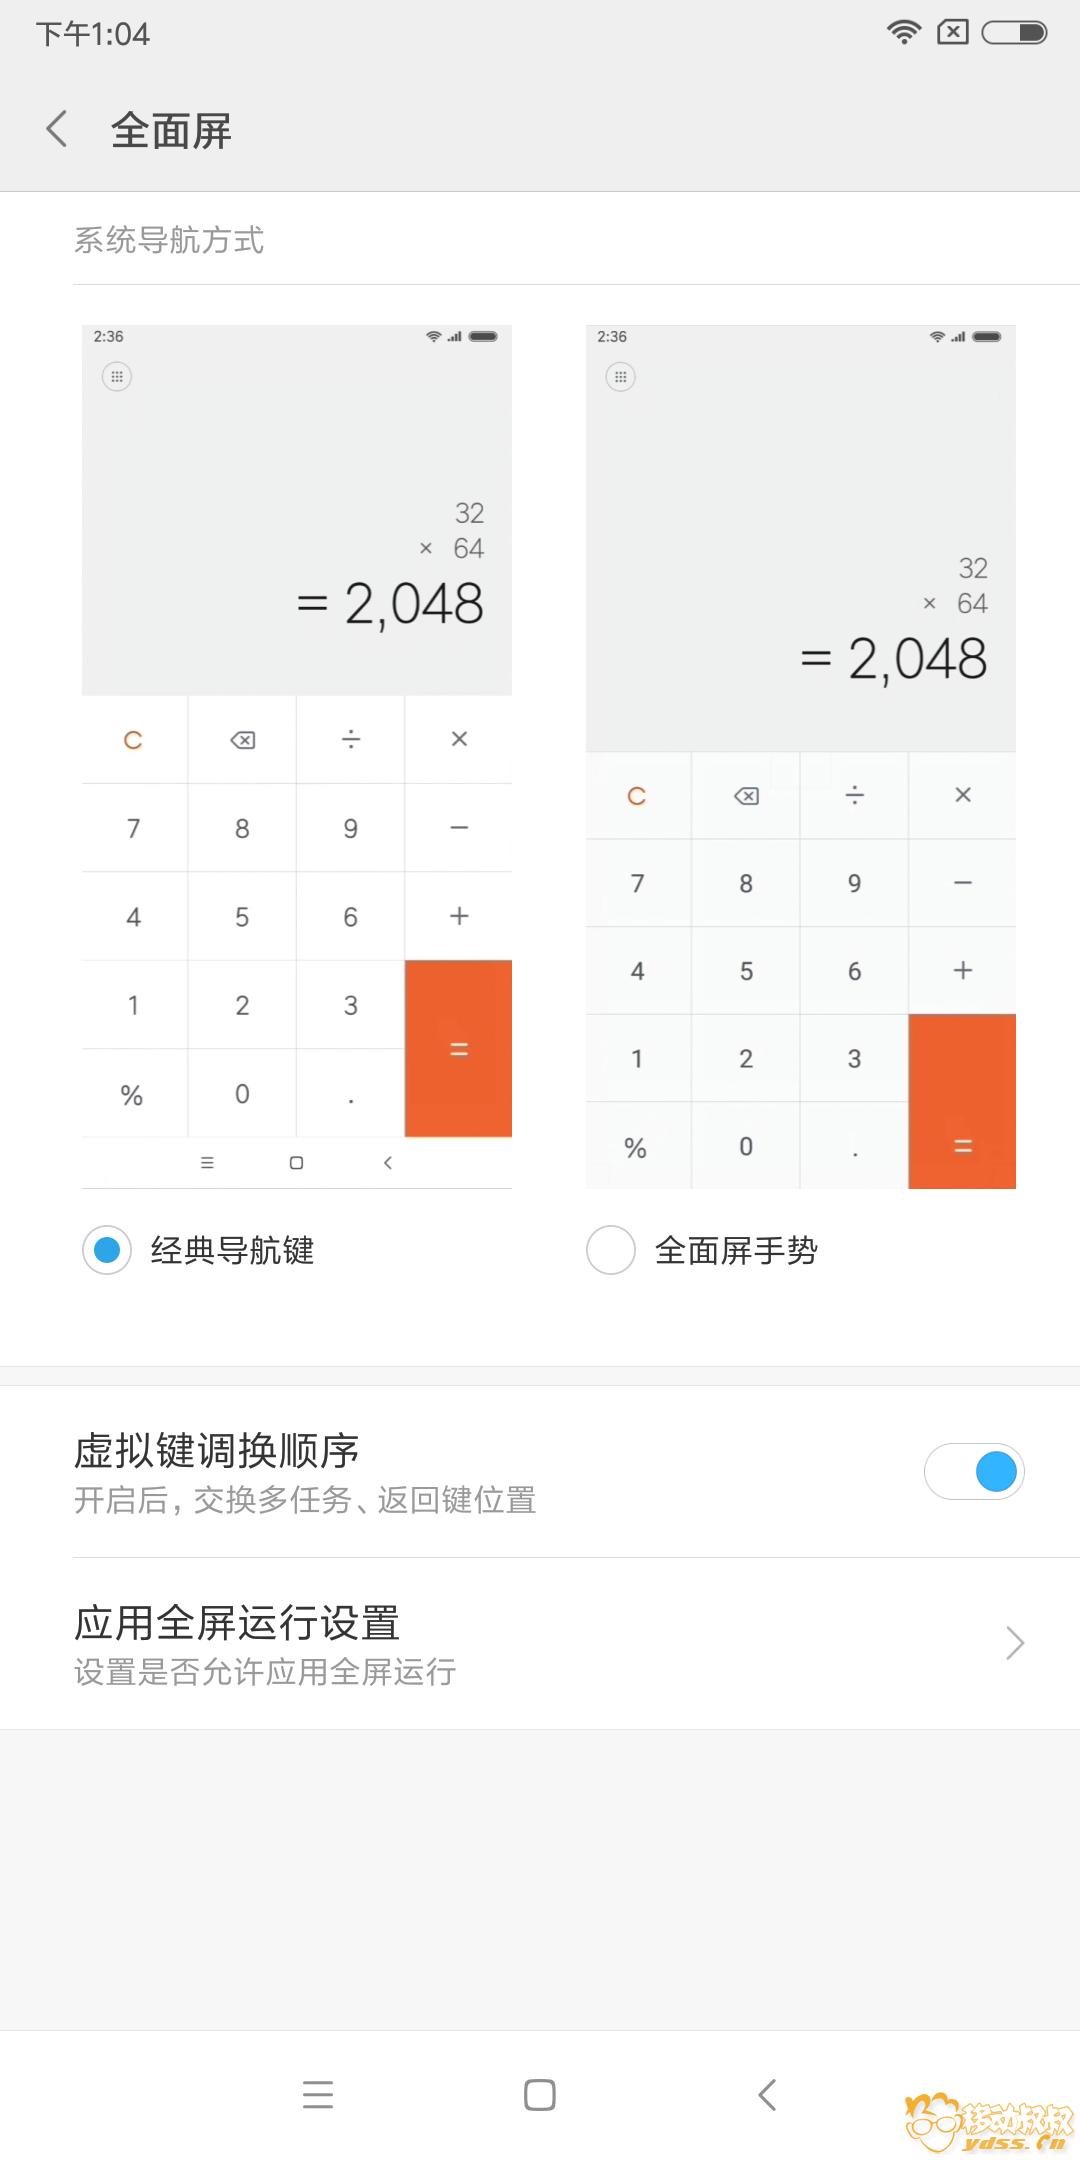 Screenshot_2017-12-31-13-04-50-839_com.android.settings.png